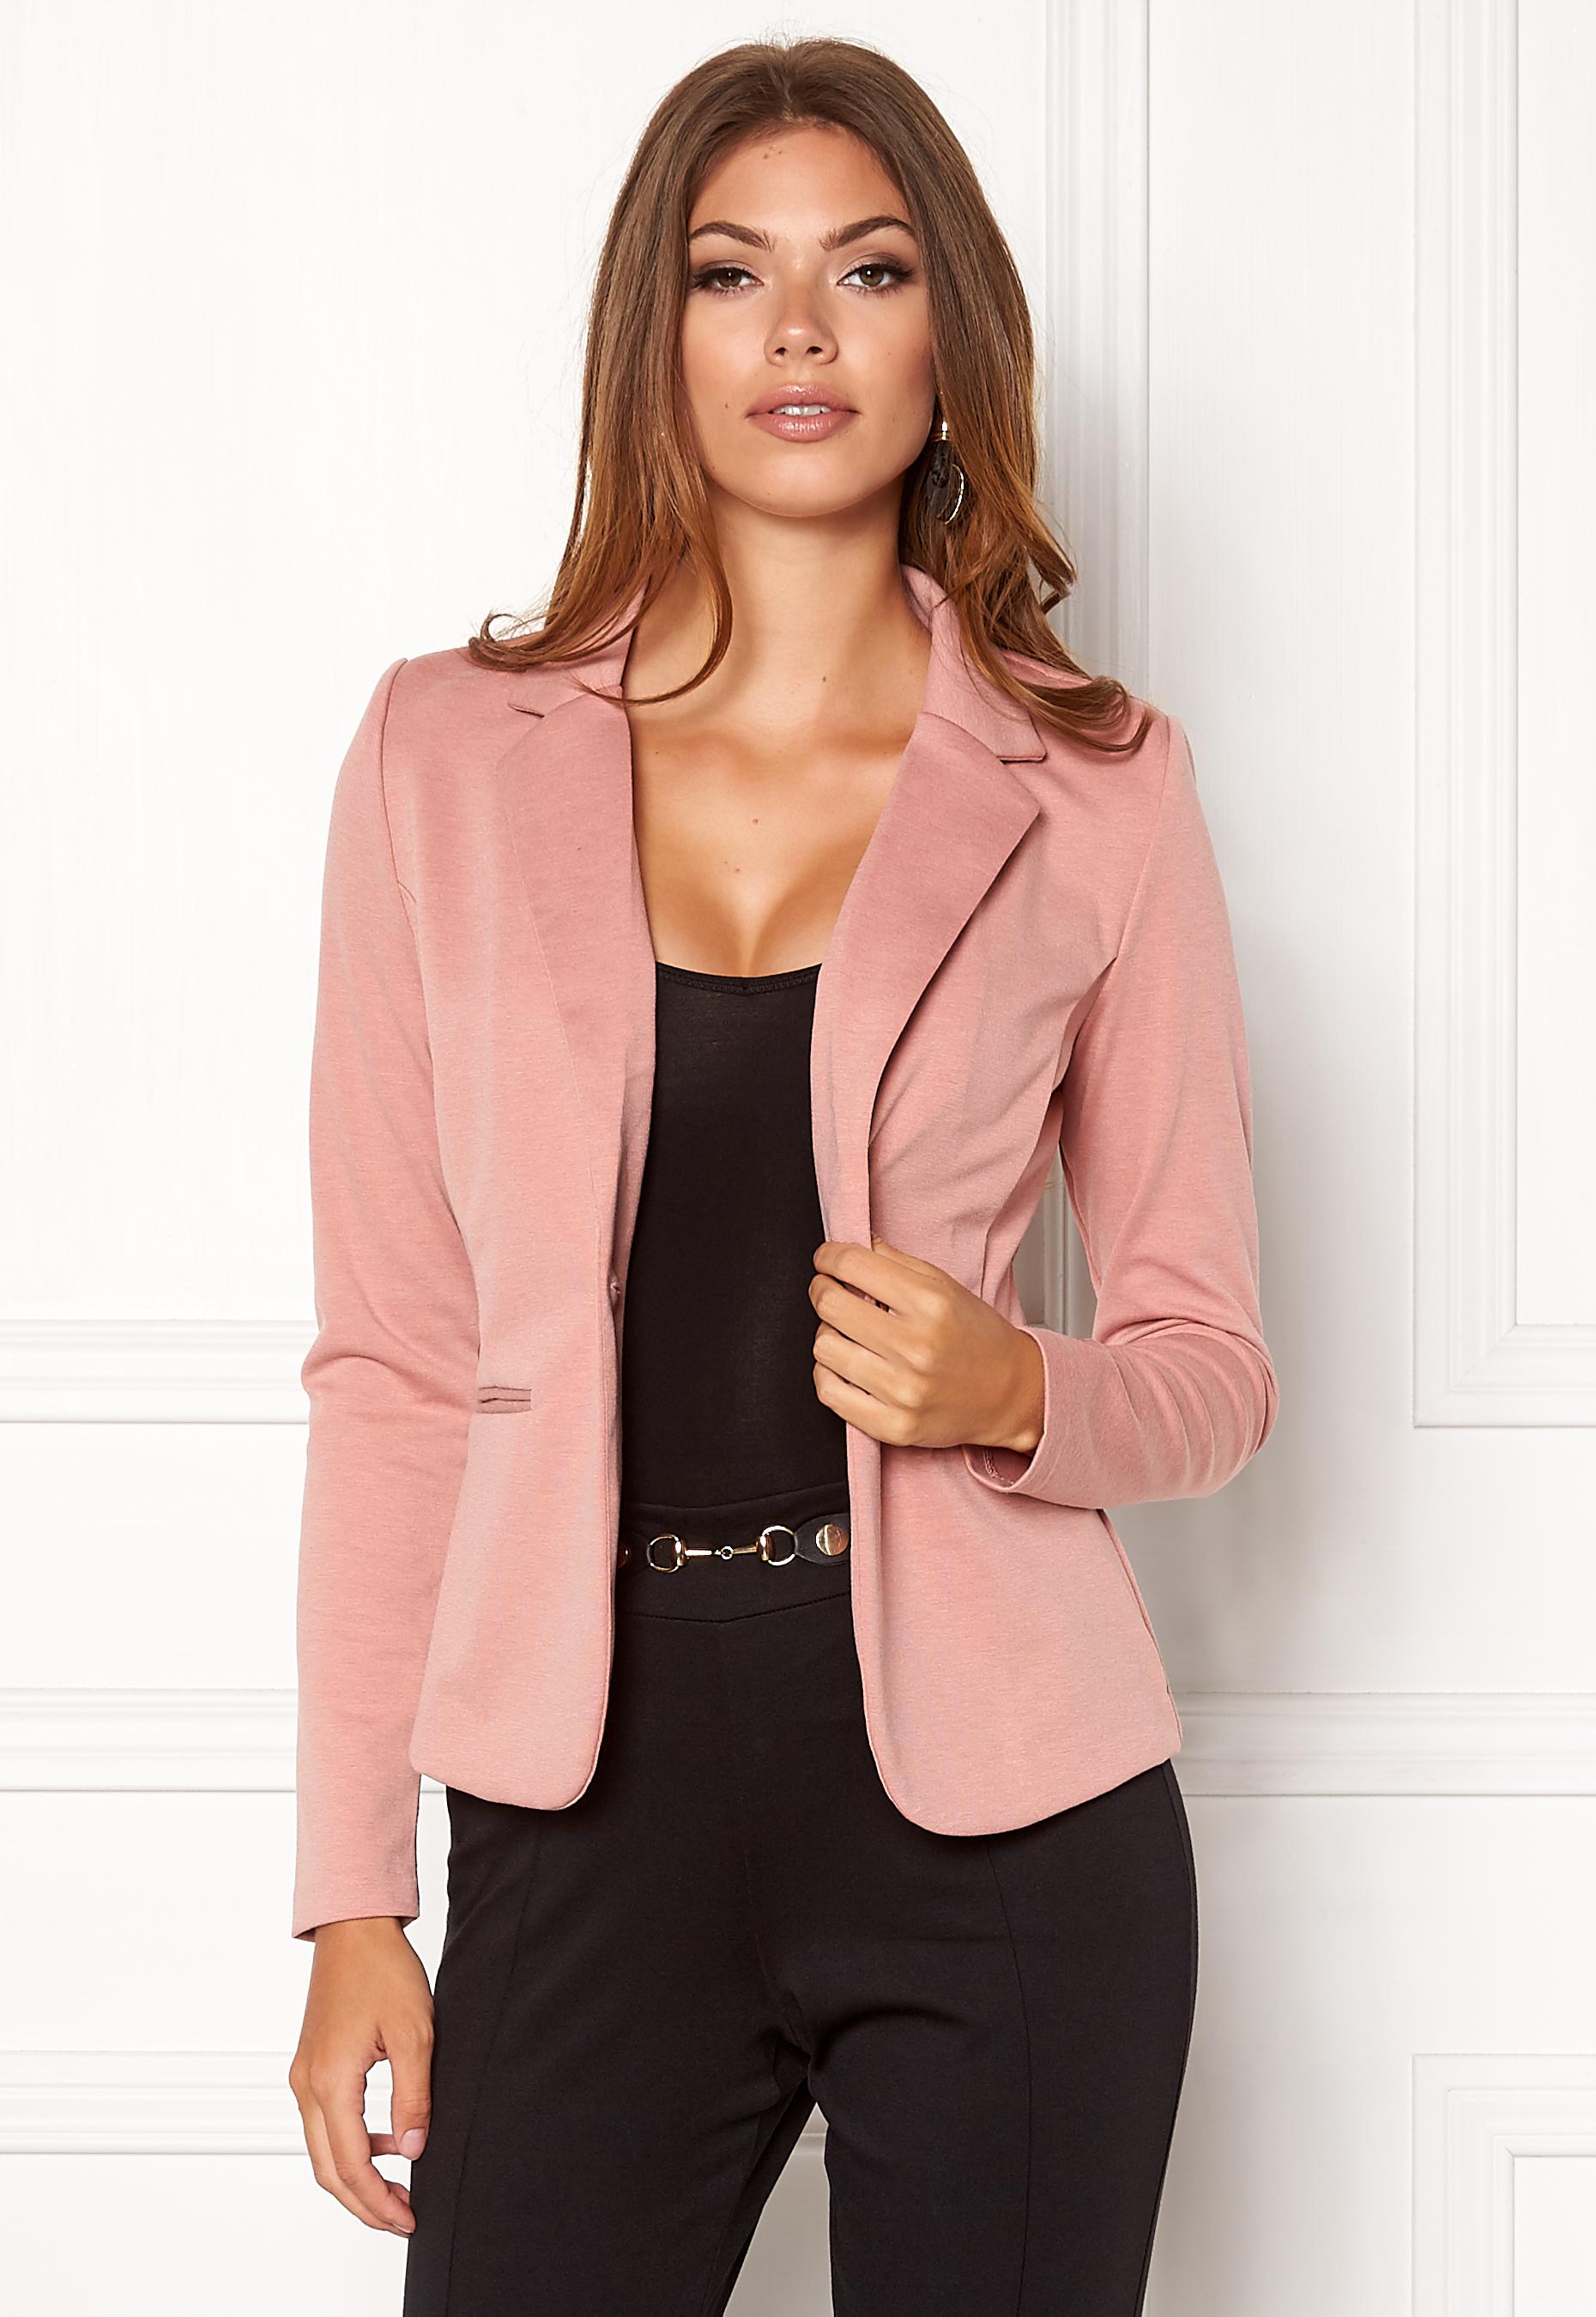 d17e4f7adcb ICHI Kate Suit Jacket Ash Rose - Bubbleroom